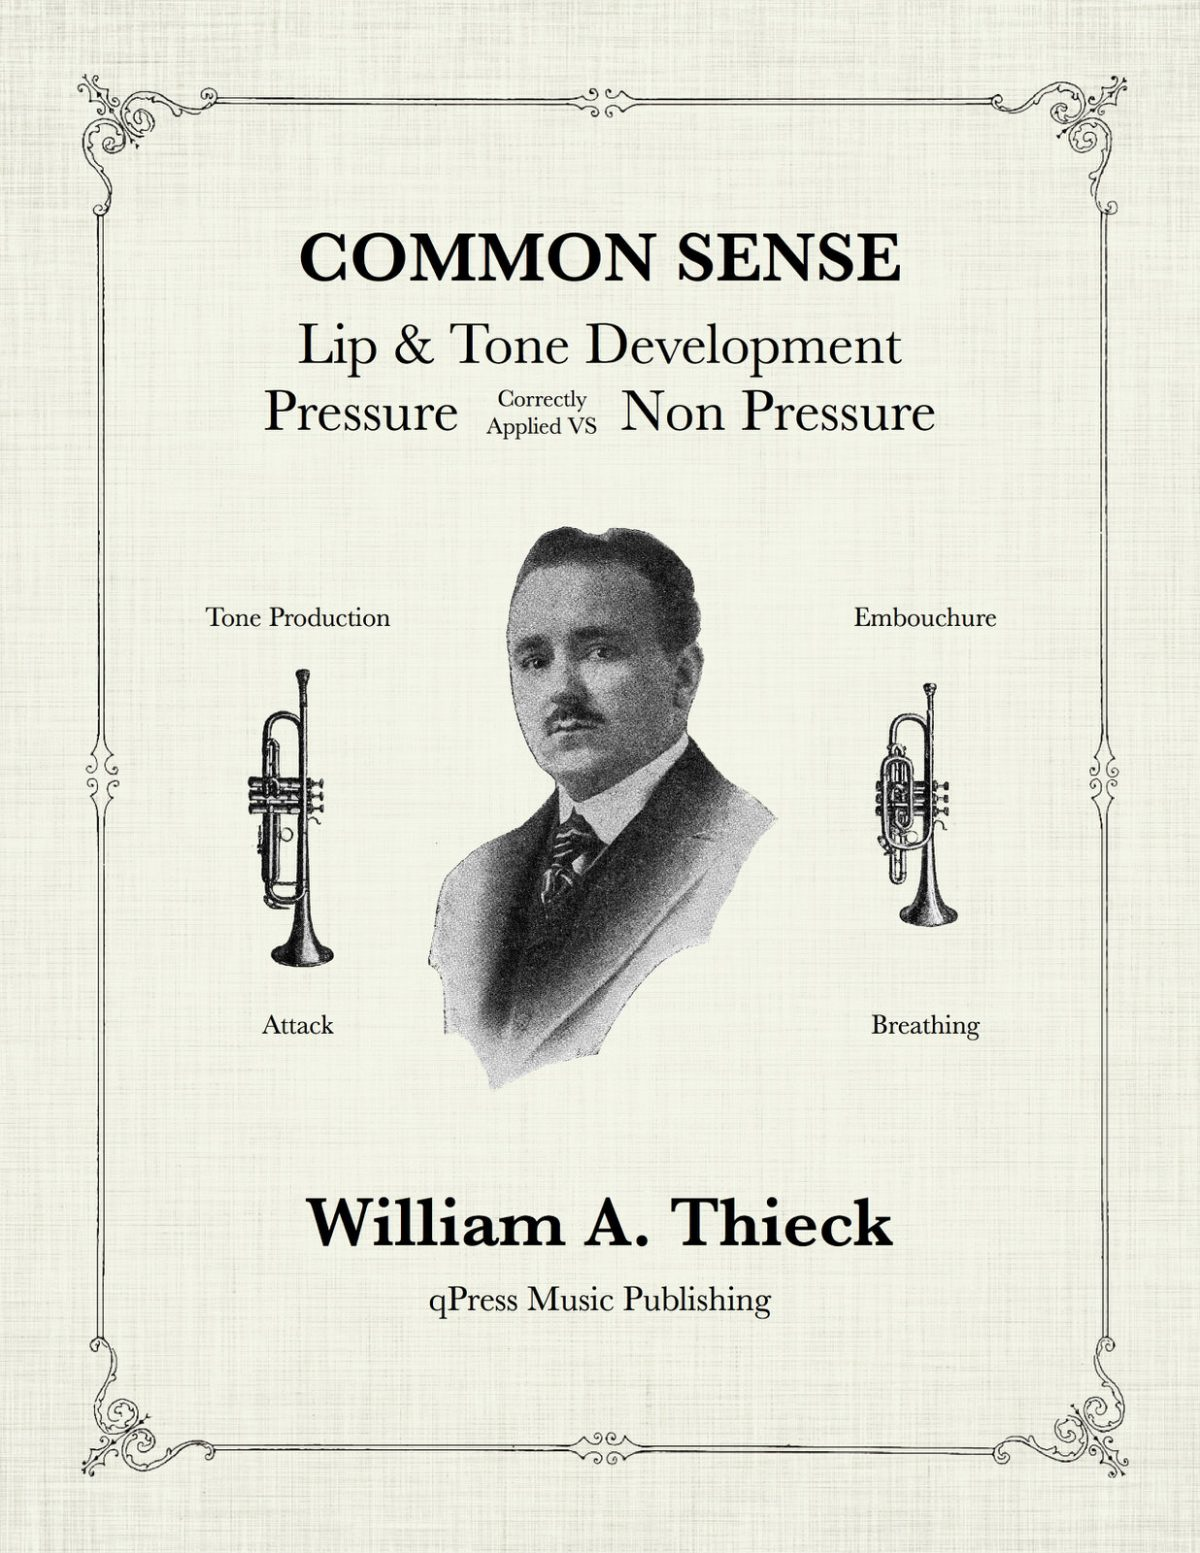 Daily Studies - Common Sense Lip & Tone Development